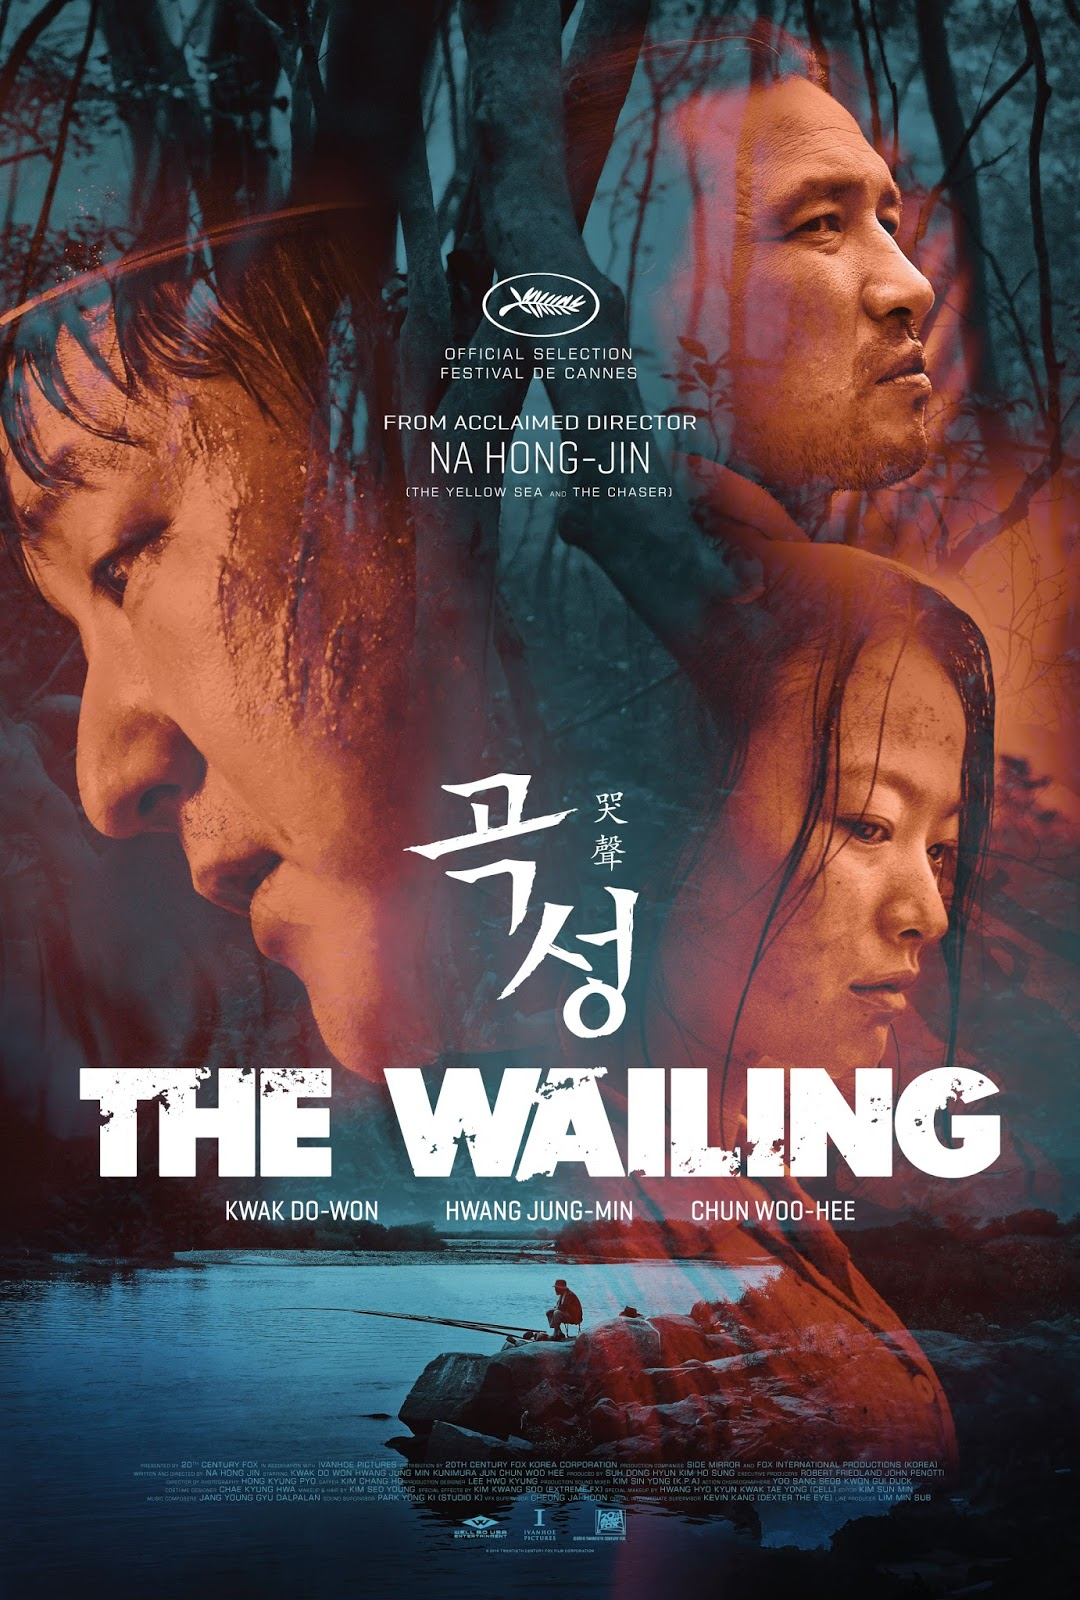 The-Wailing-Goksung-poster.jpg